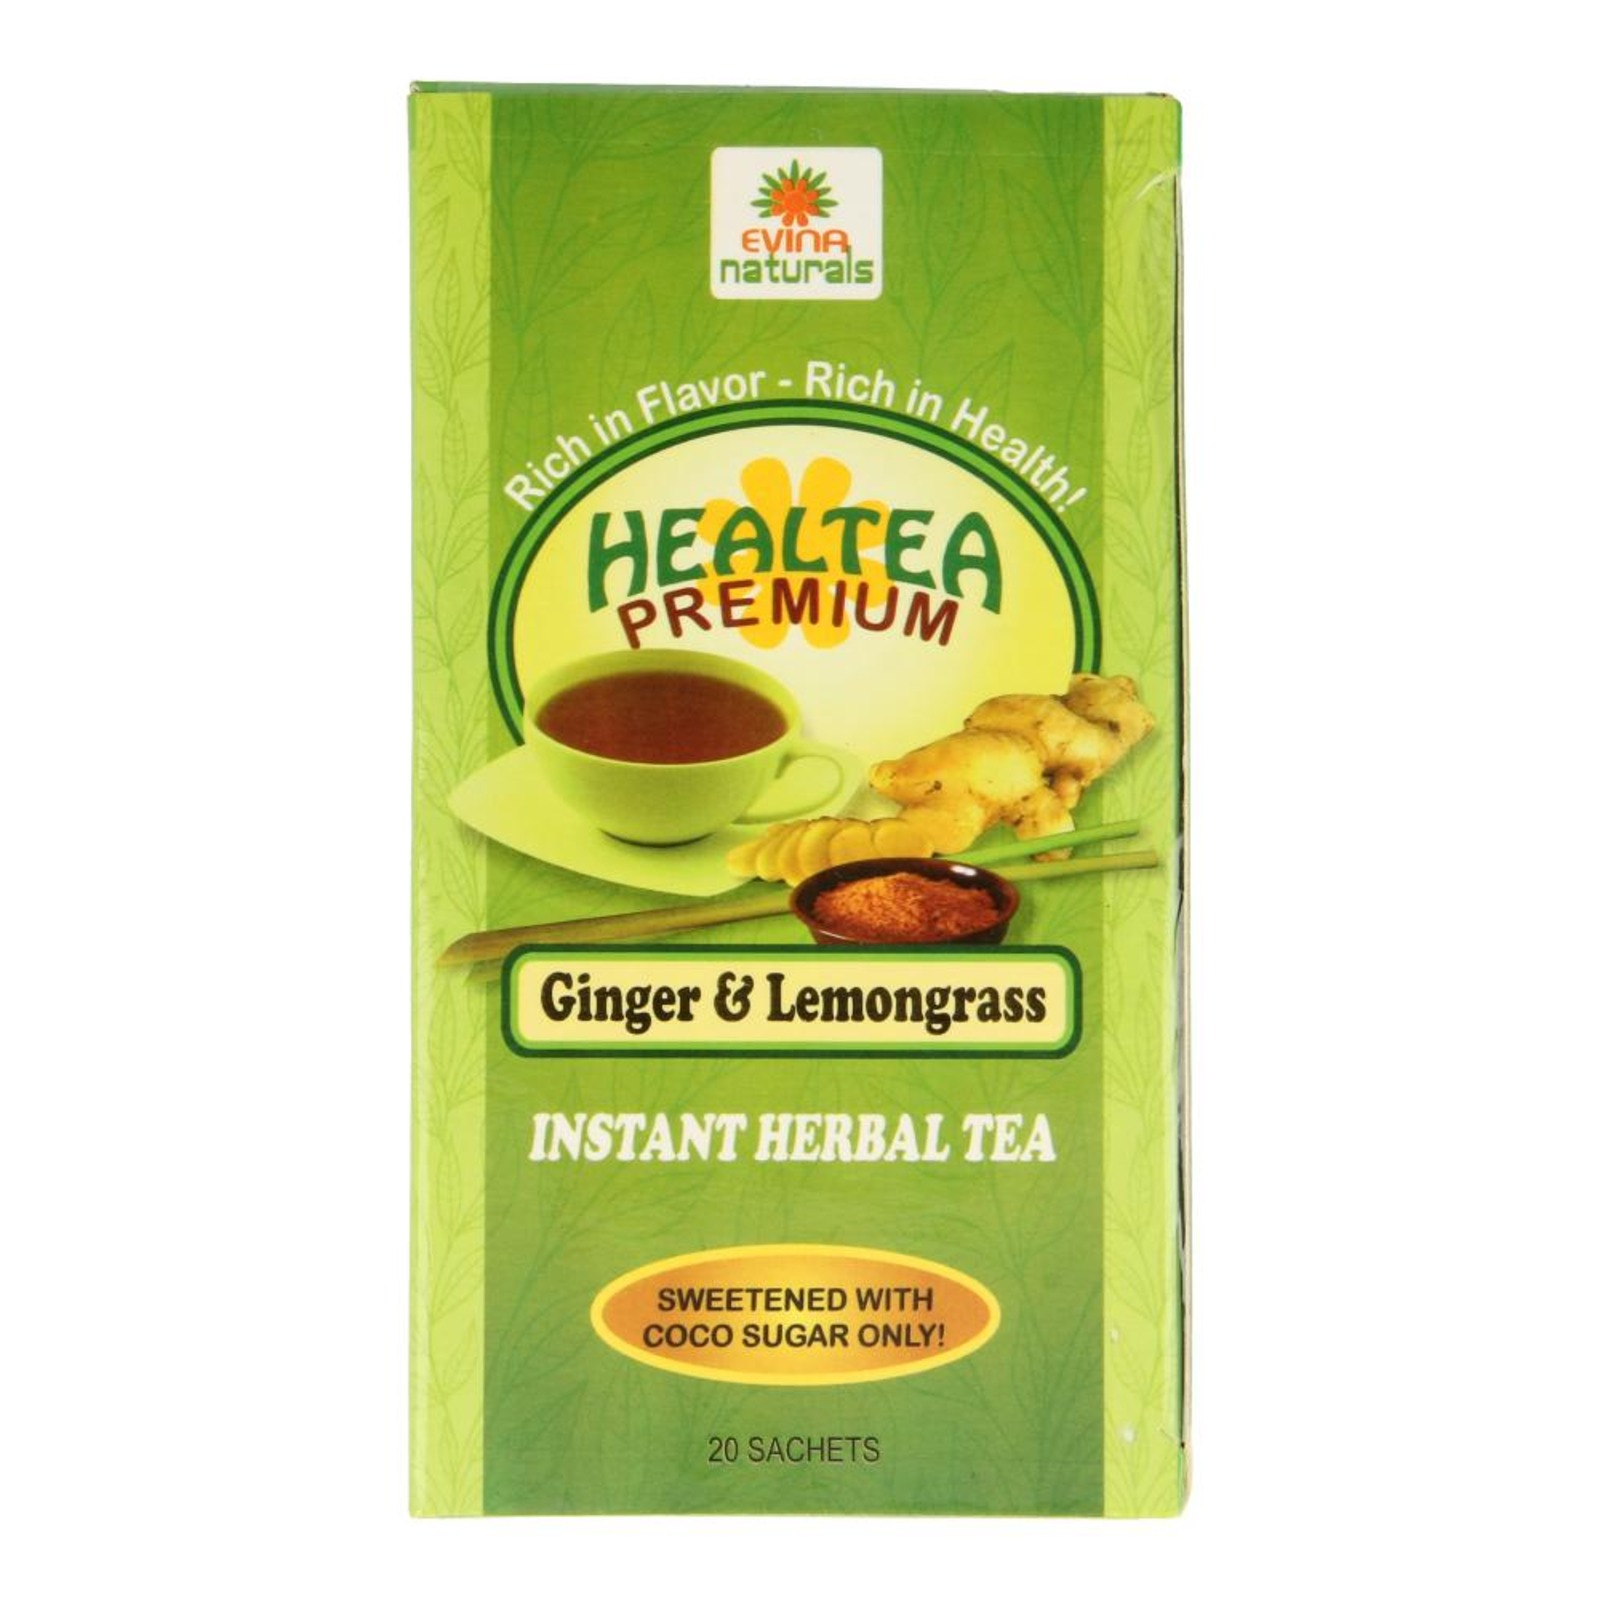 Evina Naturals Premium Ginger & Lemongrass Herbal Tea 20 x 7g